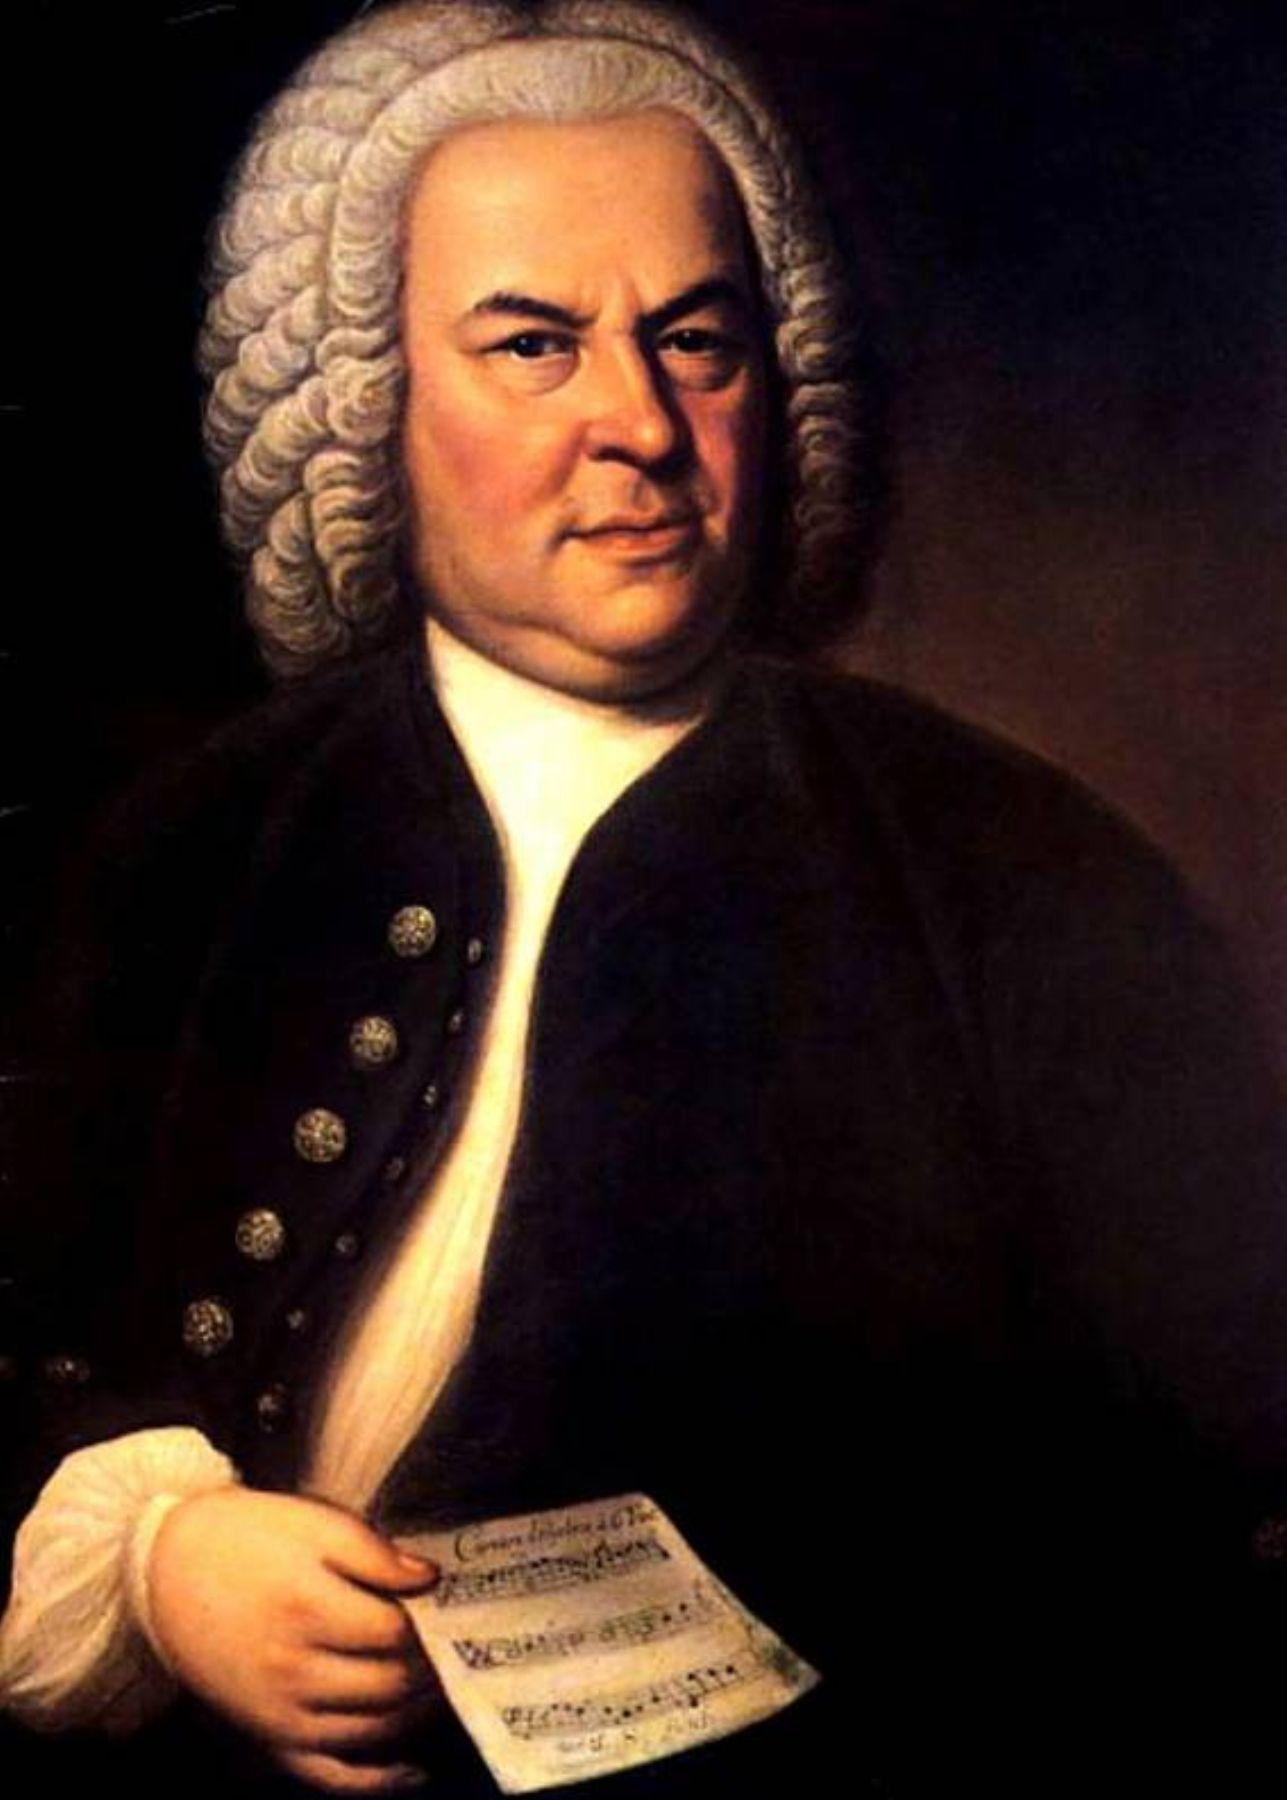 Compositor Johann Sebastian Bach. Internet/Medios